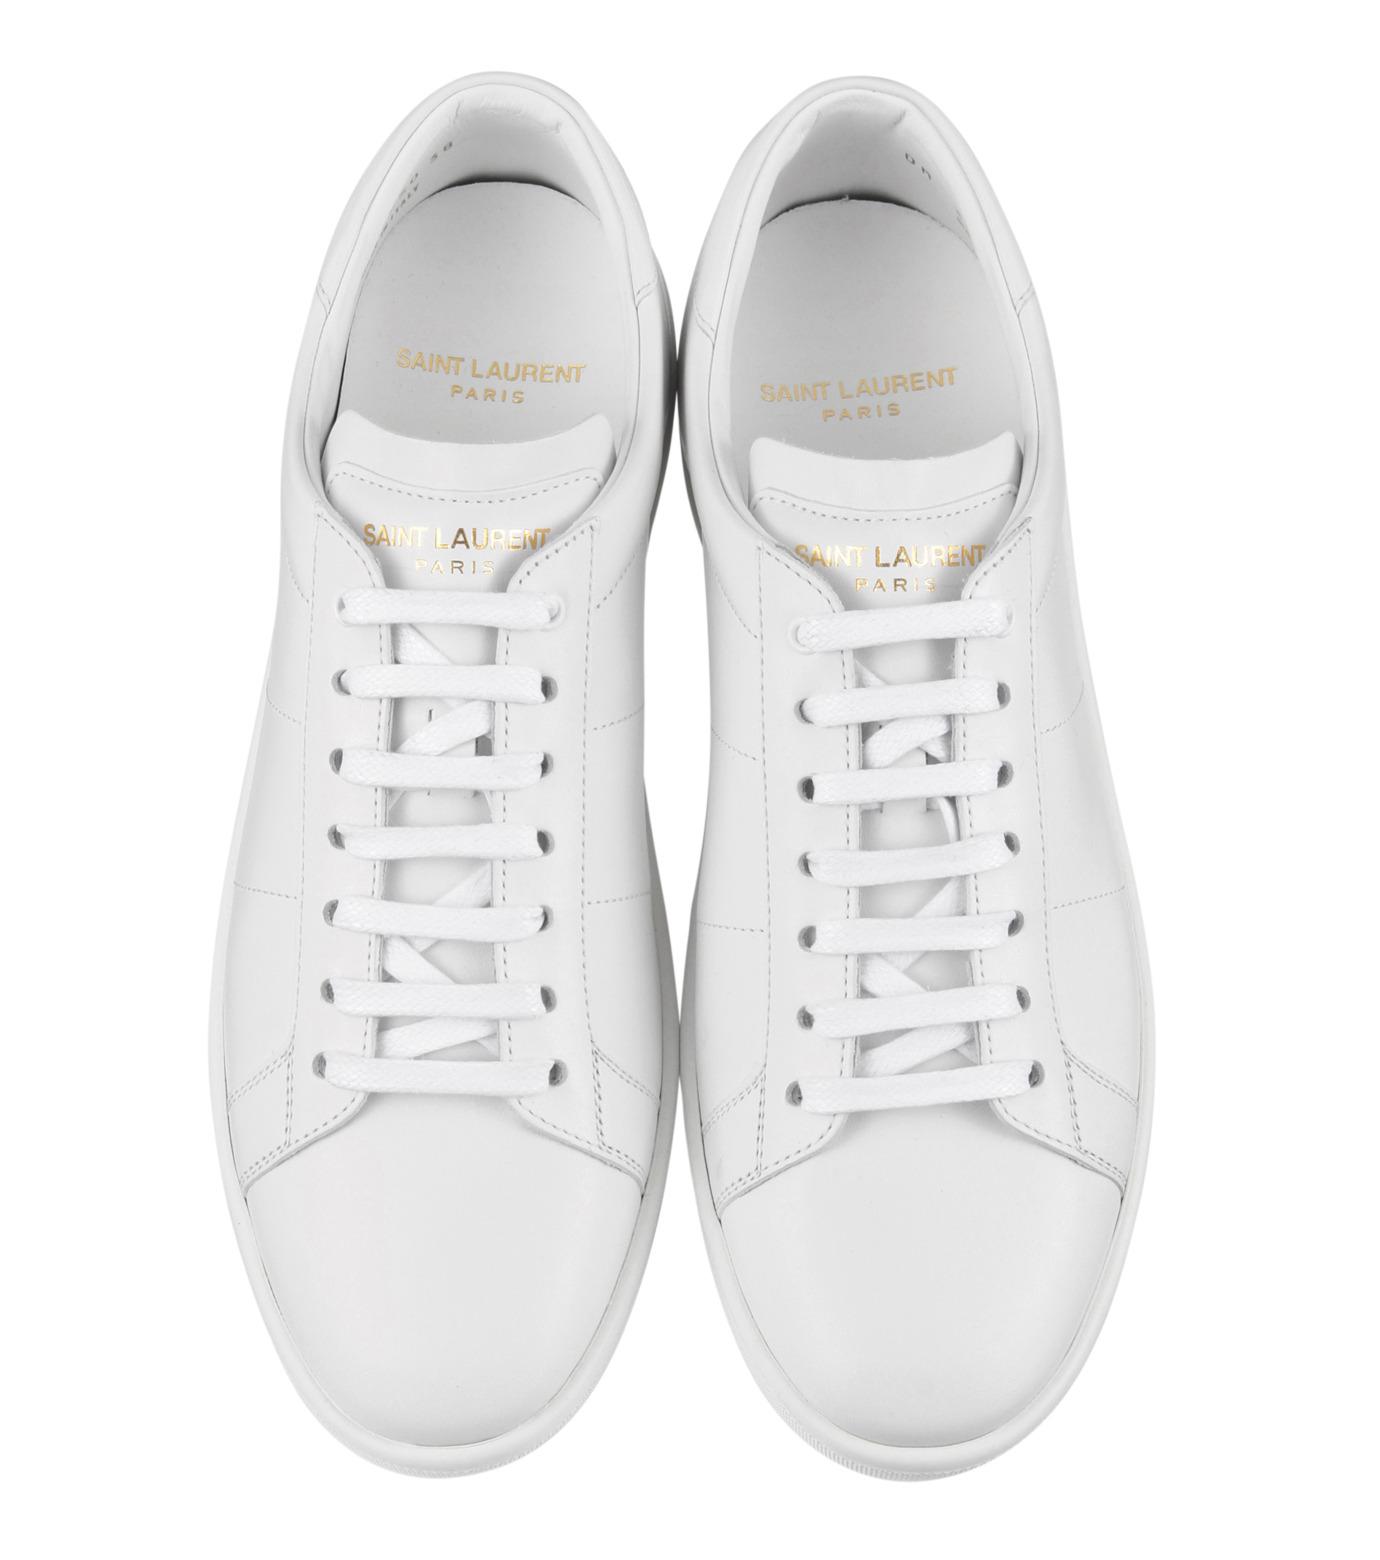 SAINT LAURENT(サンローラン)のLow Top Sneaker-WHITE-336250-AQI00-4 拡大詳細画像4